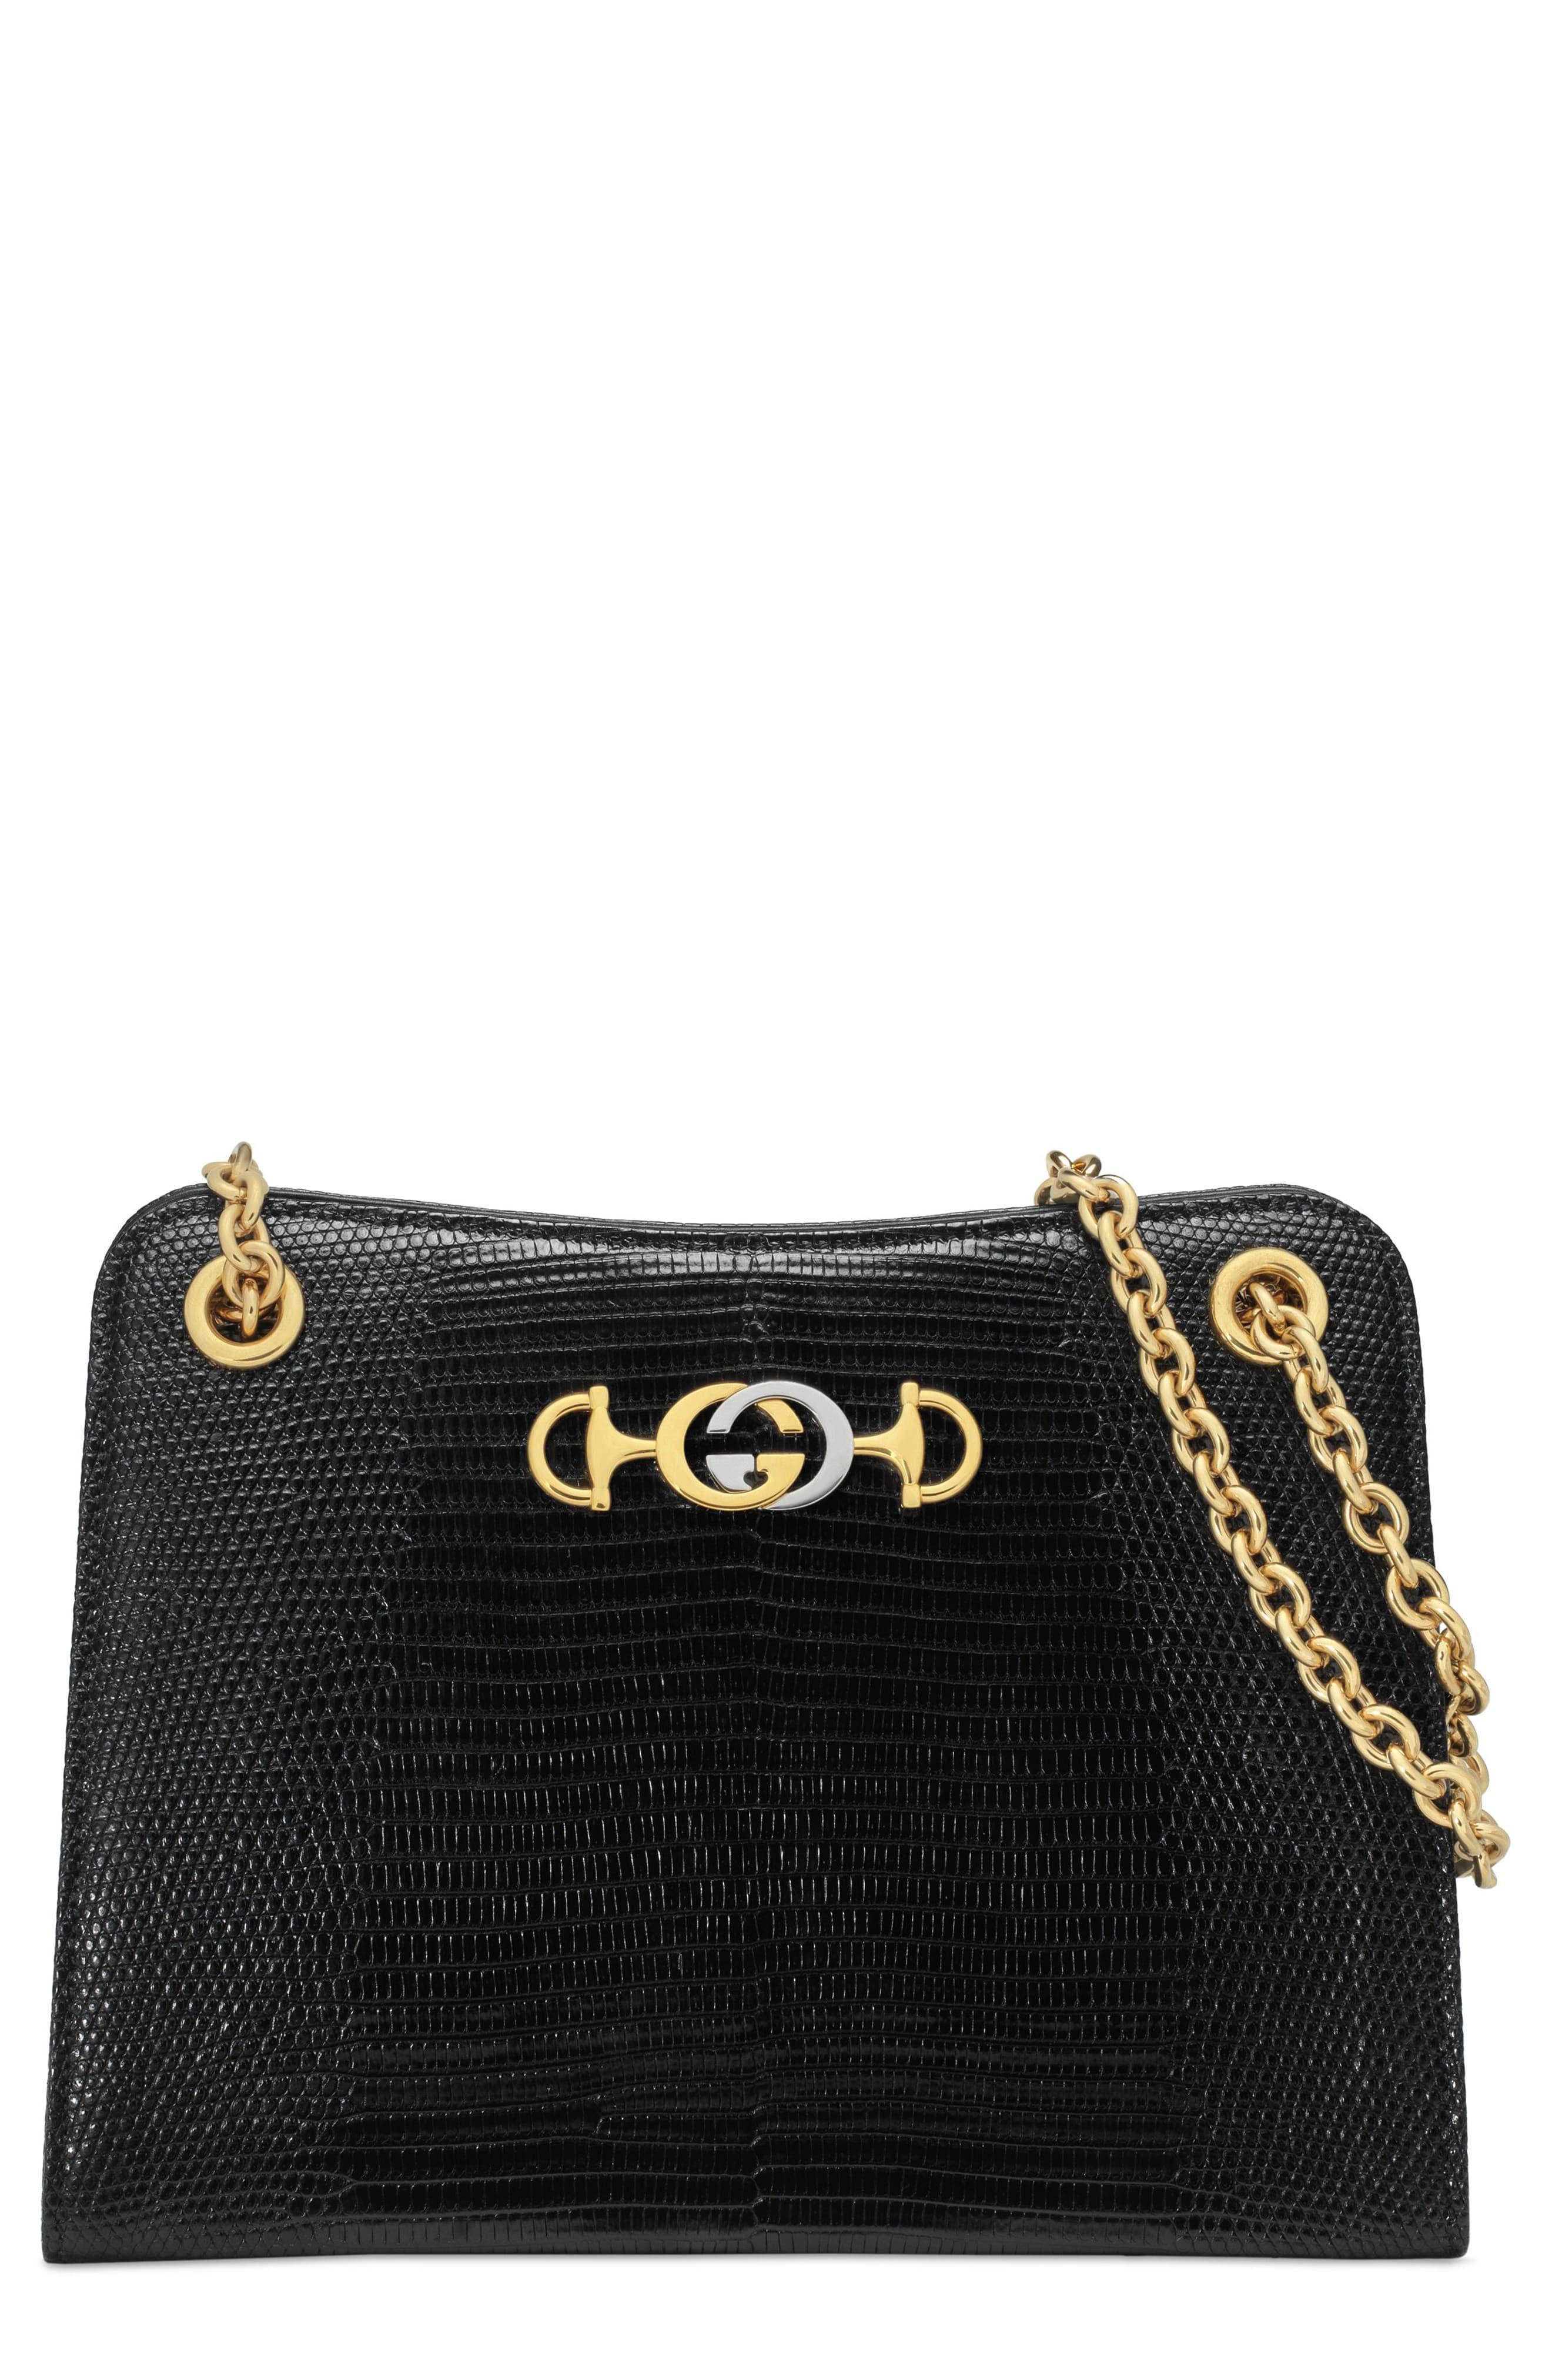 b687a962c Gucci Small Zumi Genuine Lizardskin Shoulder Bag in 2019 | Products ...